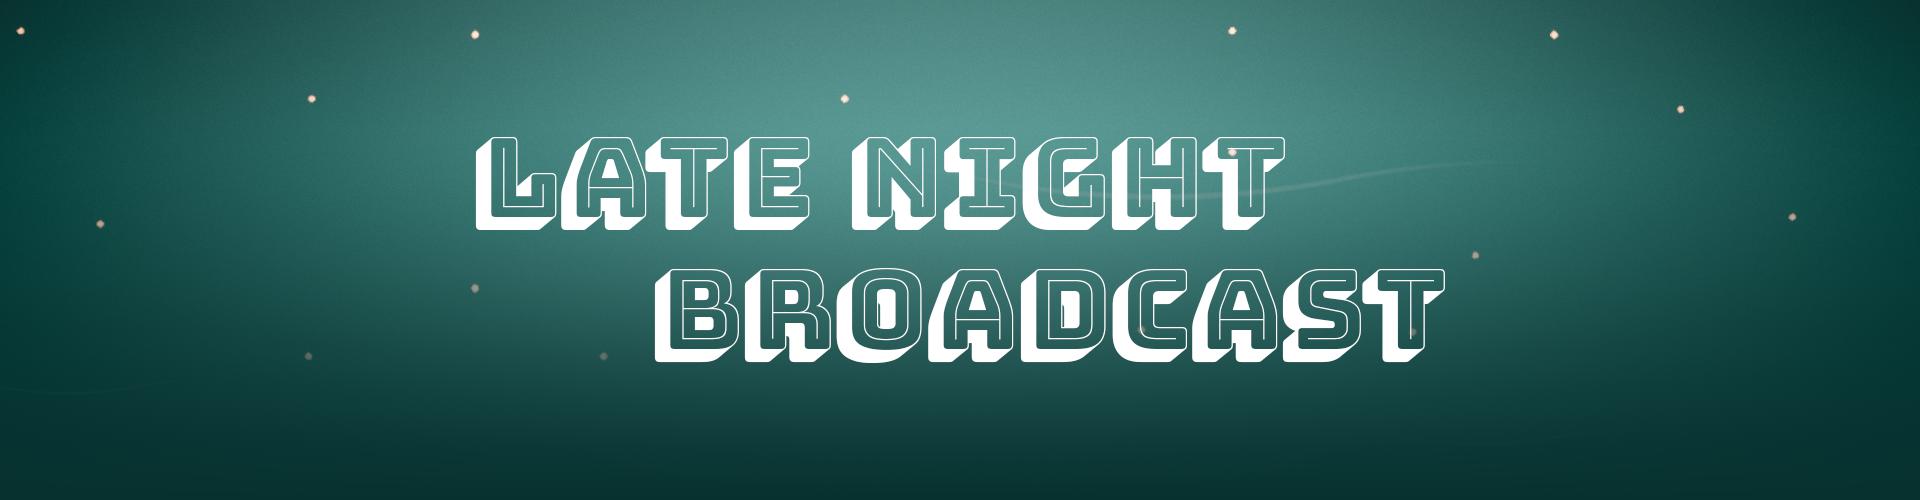 Late Night Broadcast